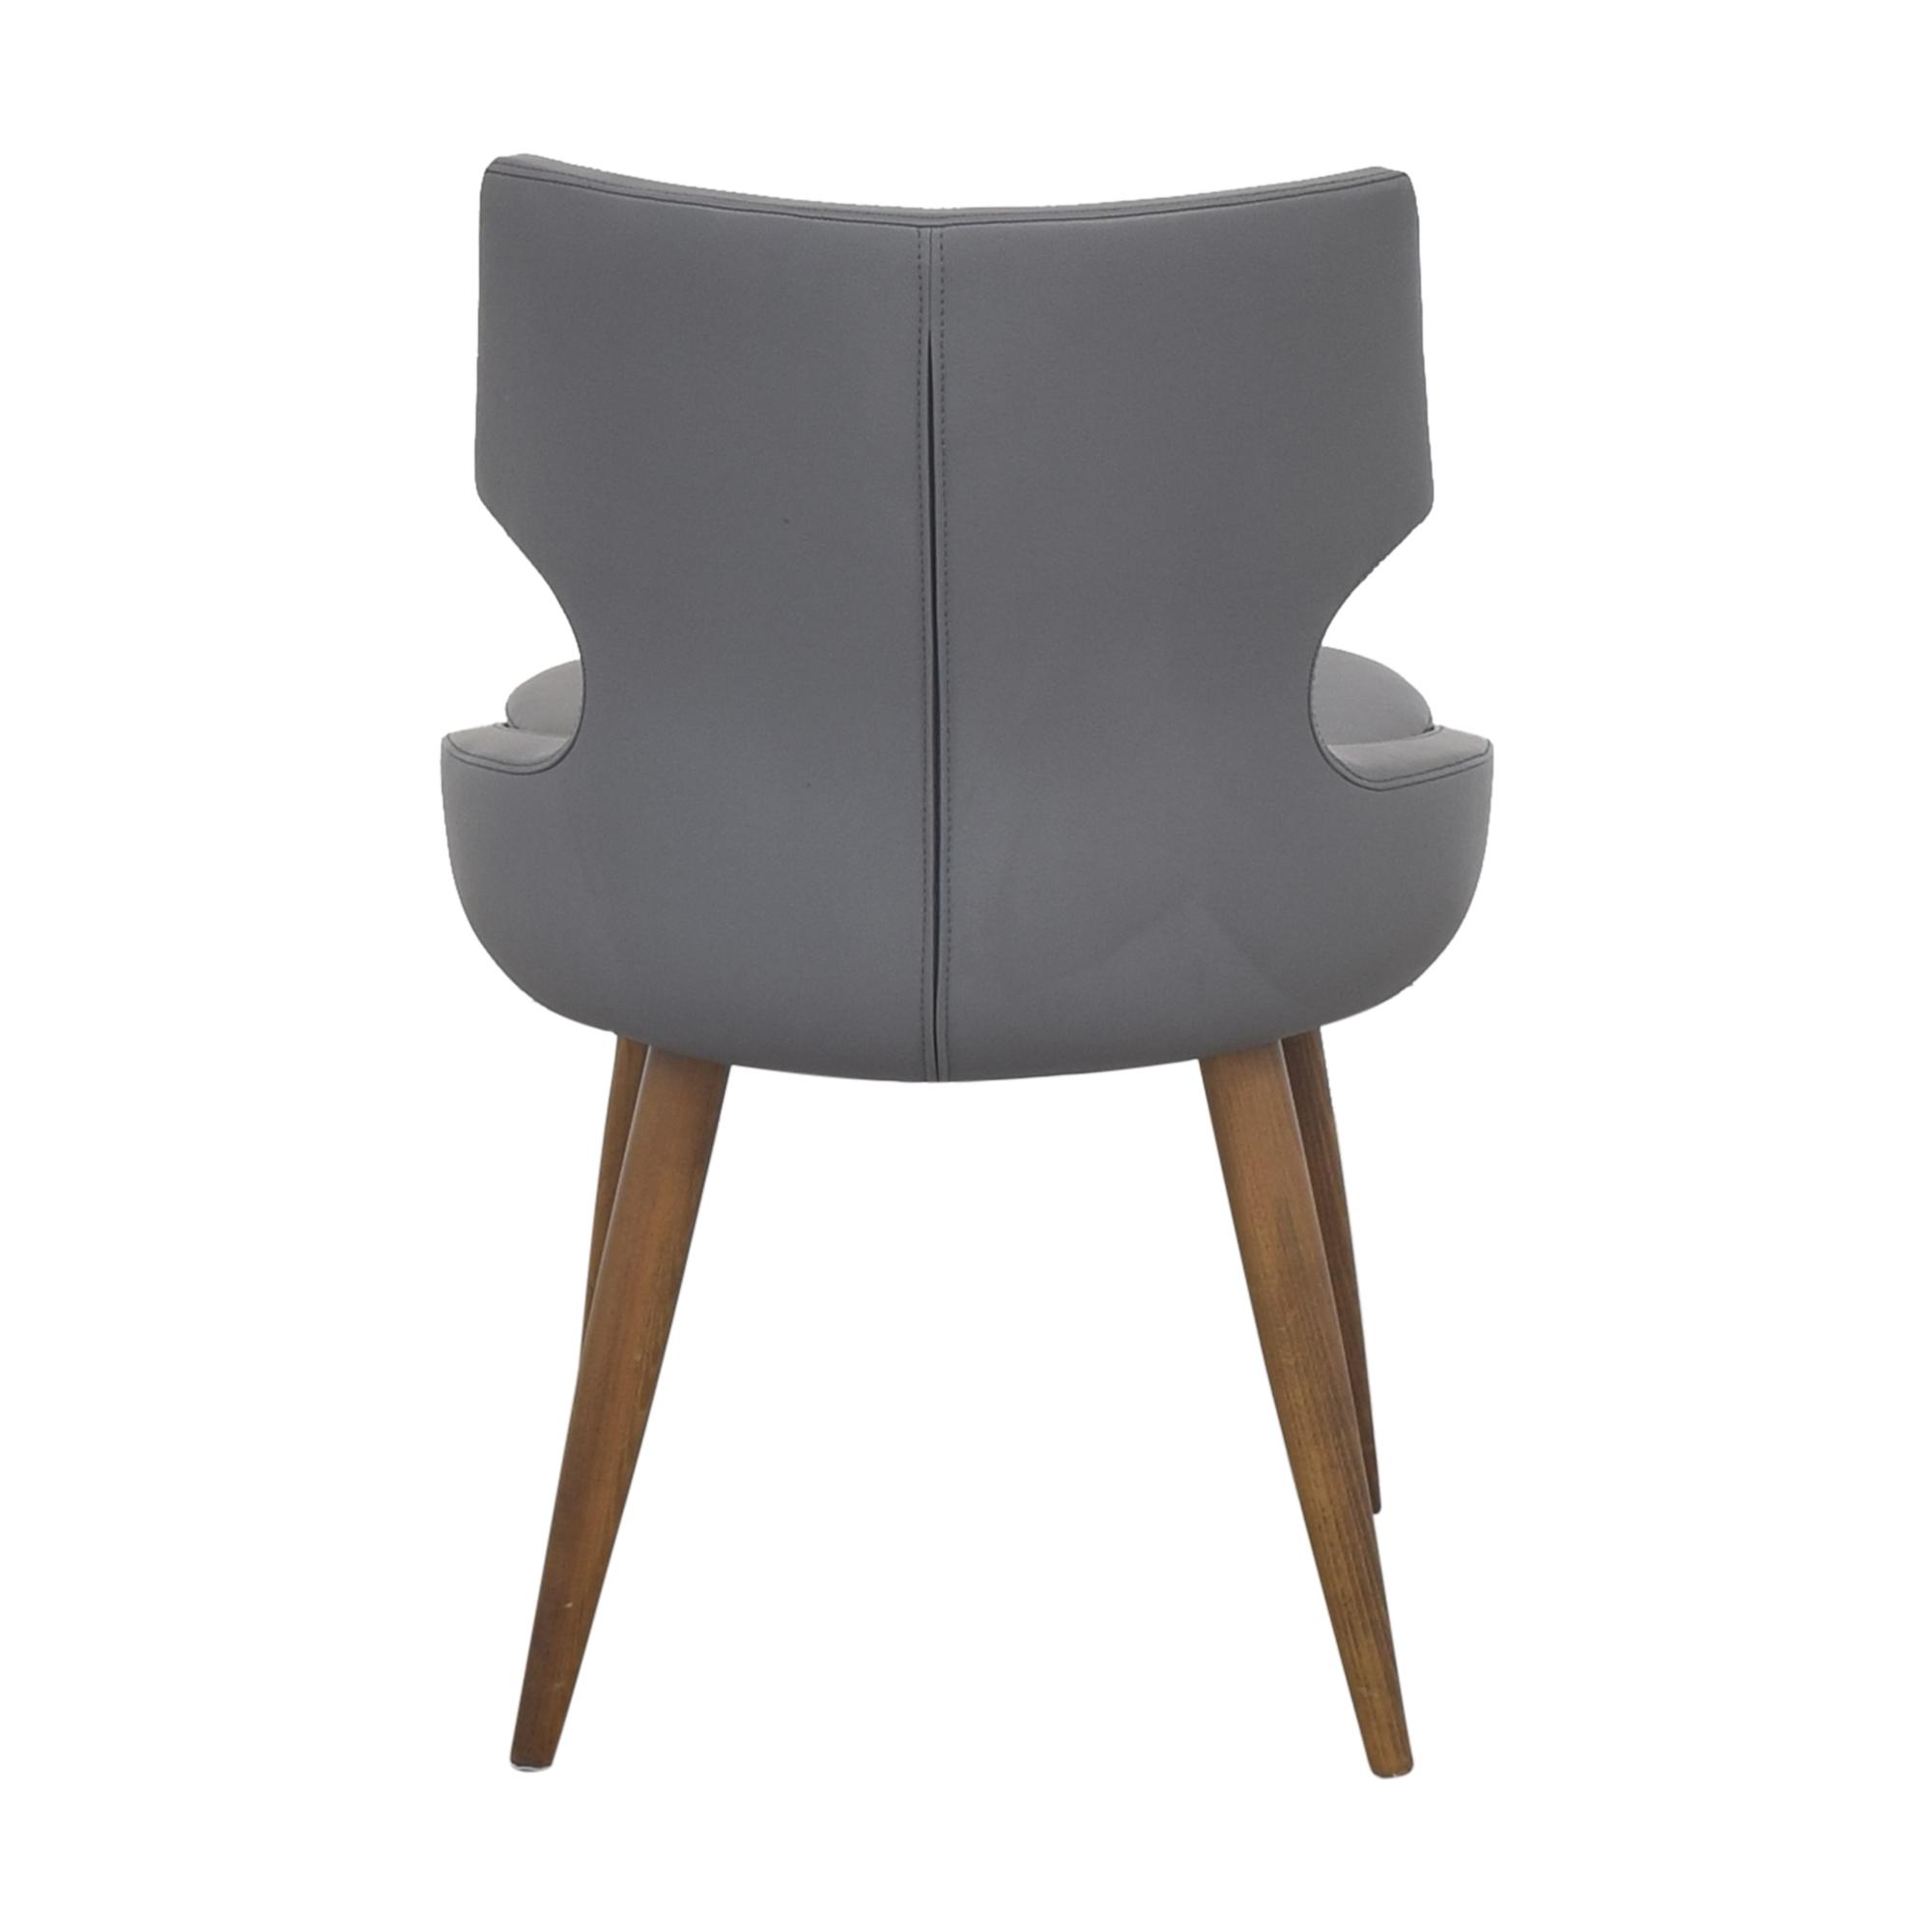 buy sohoConcept sohoConcept Patara Dining Chair online